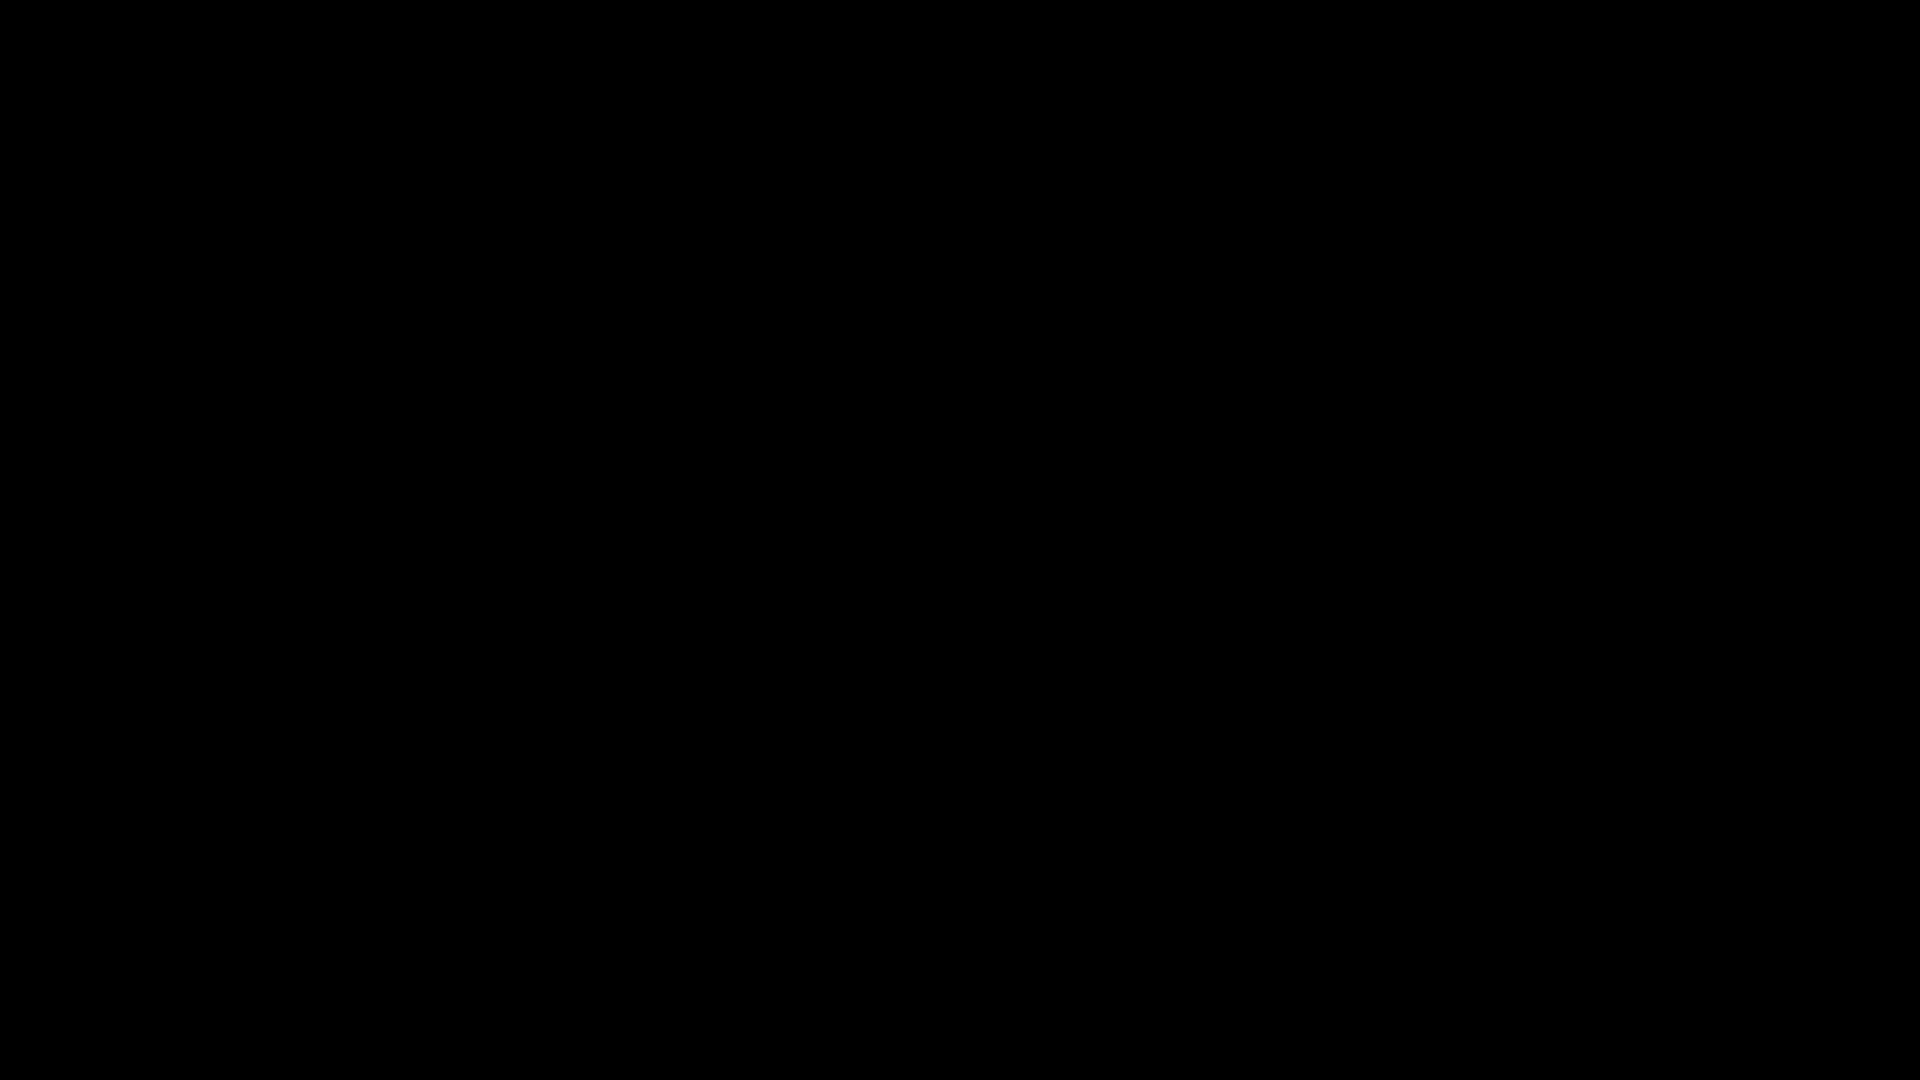 50STUNT, AXLE, BIG, BORE, COMPETITION, CRF50, GBGX3M, HANDBRAKE, KITS, MINI, MOTO, PEGS, SLIDERS, STUNT, UPERMOTO, VIDEO, WHEELS, gbg, gbgx3mtv, mx_josef, Gbgx3m - Mx_Josef 50STUNT VIDEO COMPETITION, ROUND 2  (Josef Götherskjöld) Insane Supermoto stunt GIFs